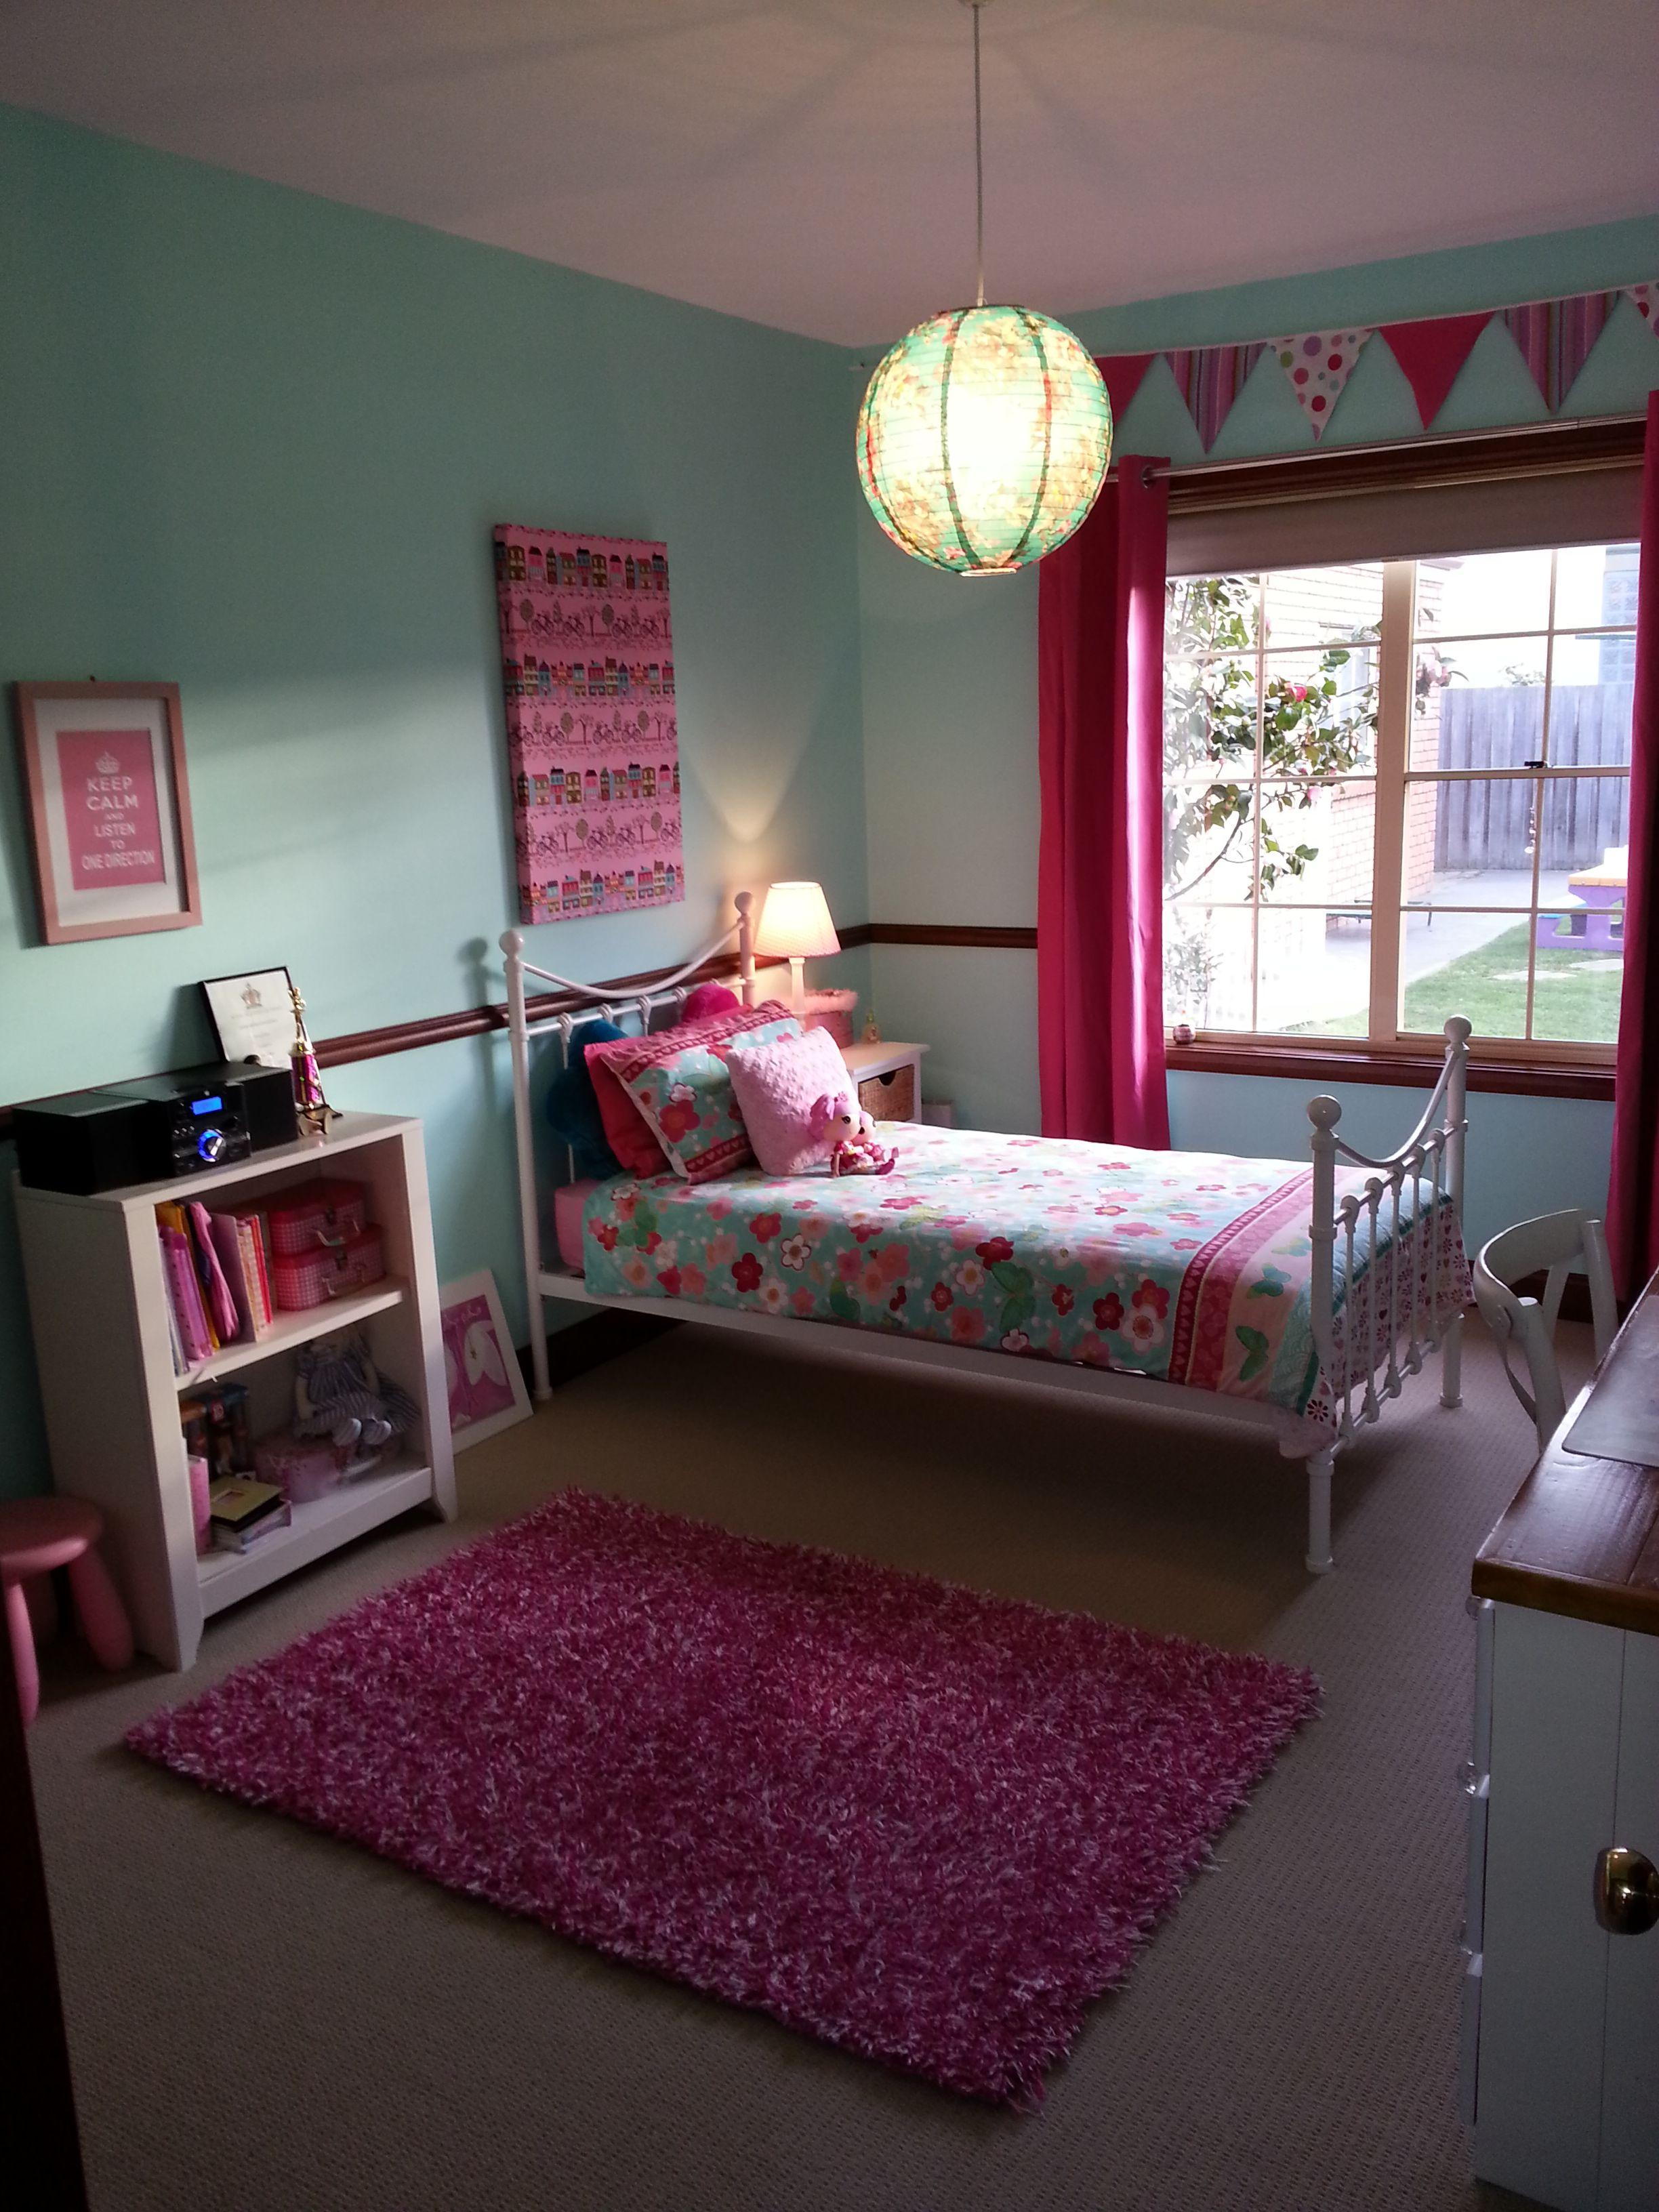 Dulux Kids Bedroom In A Box: Love The Aqua Wall Colour